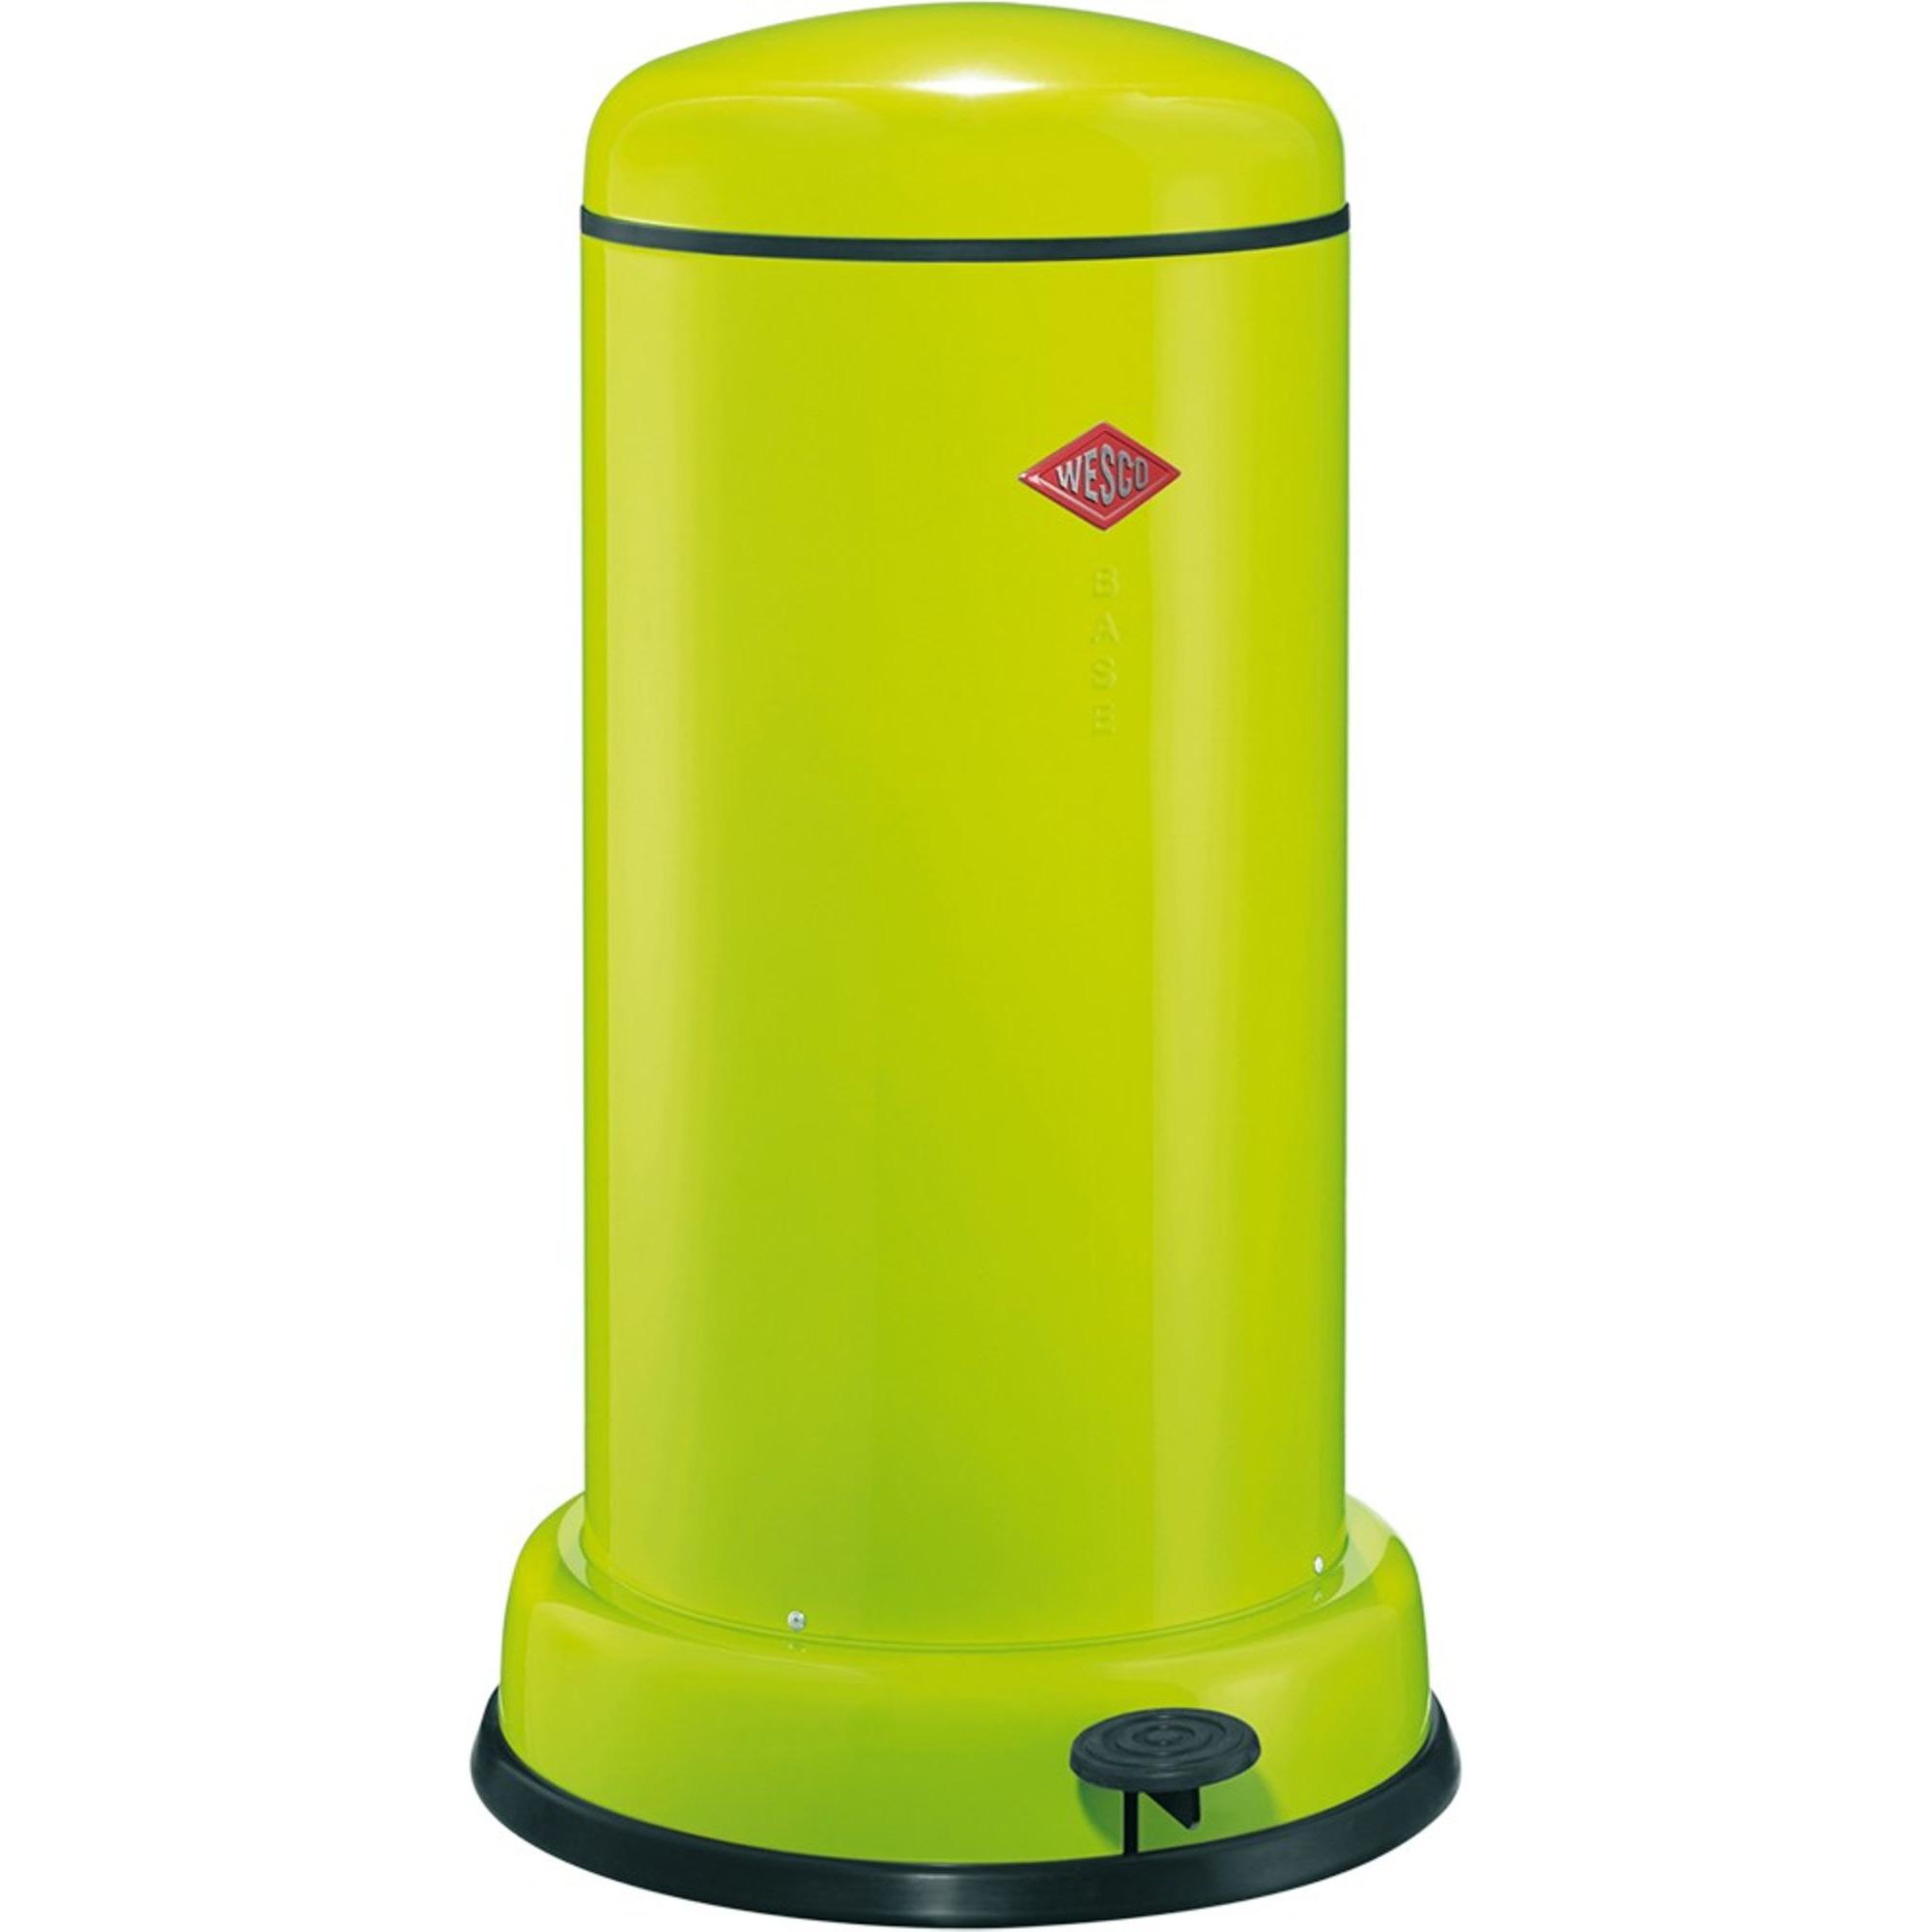 Wesco 20 liter Baseboy Lime